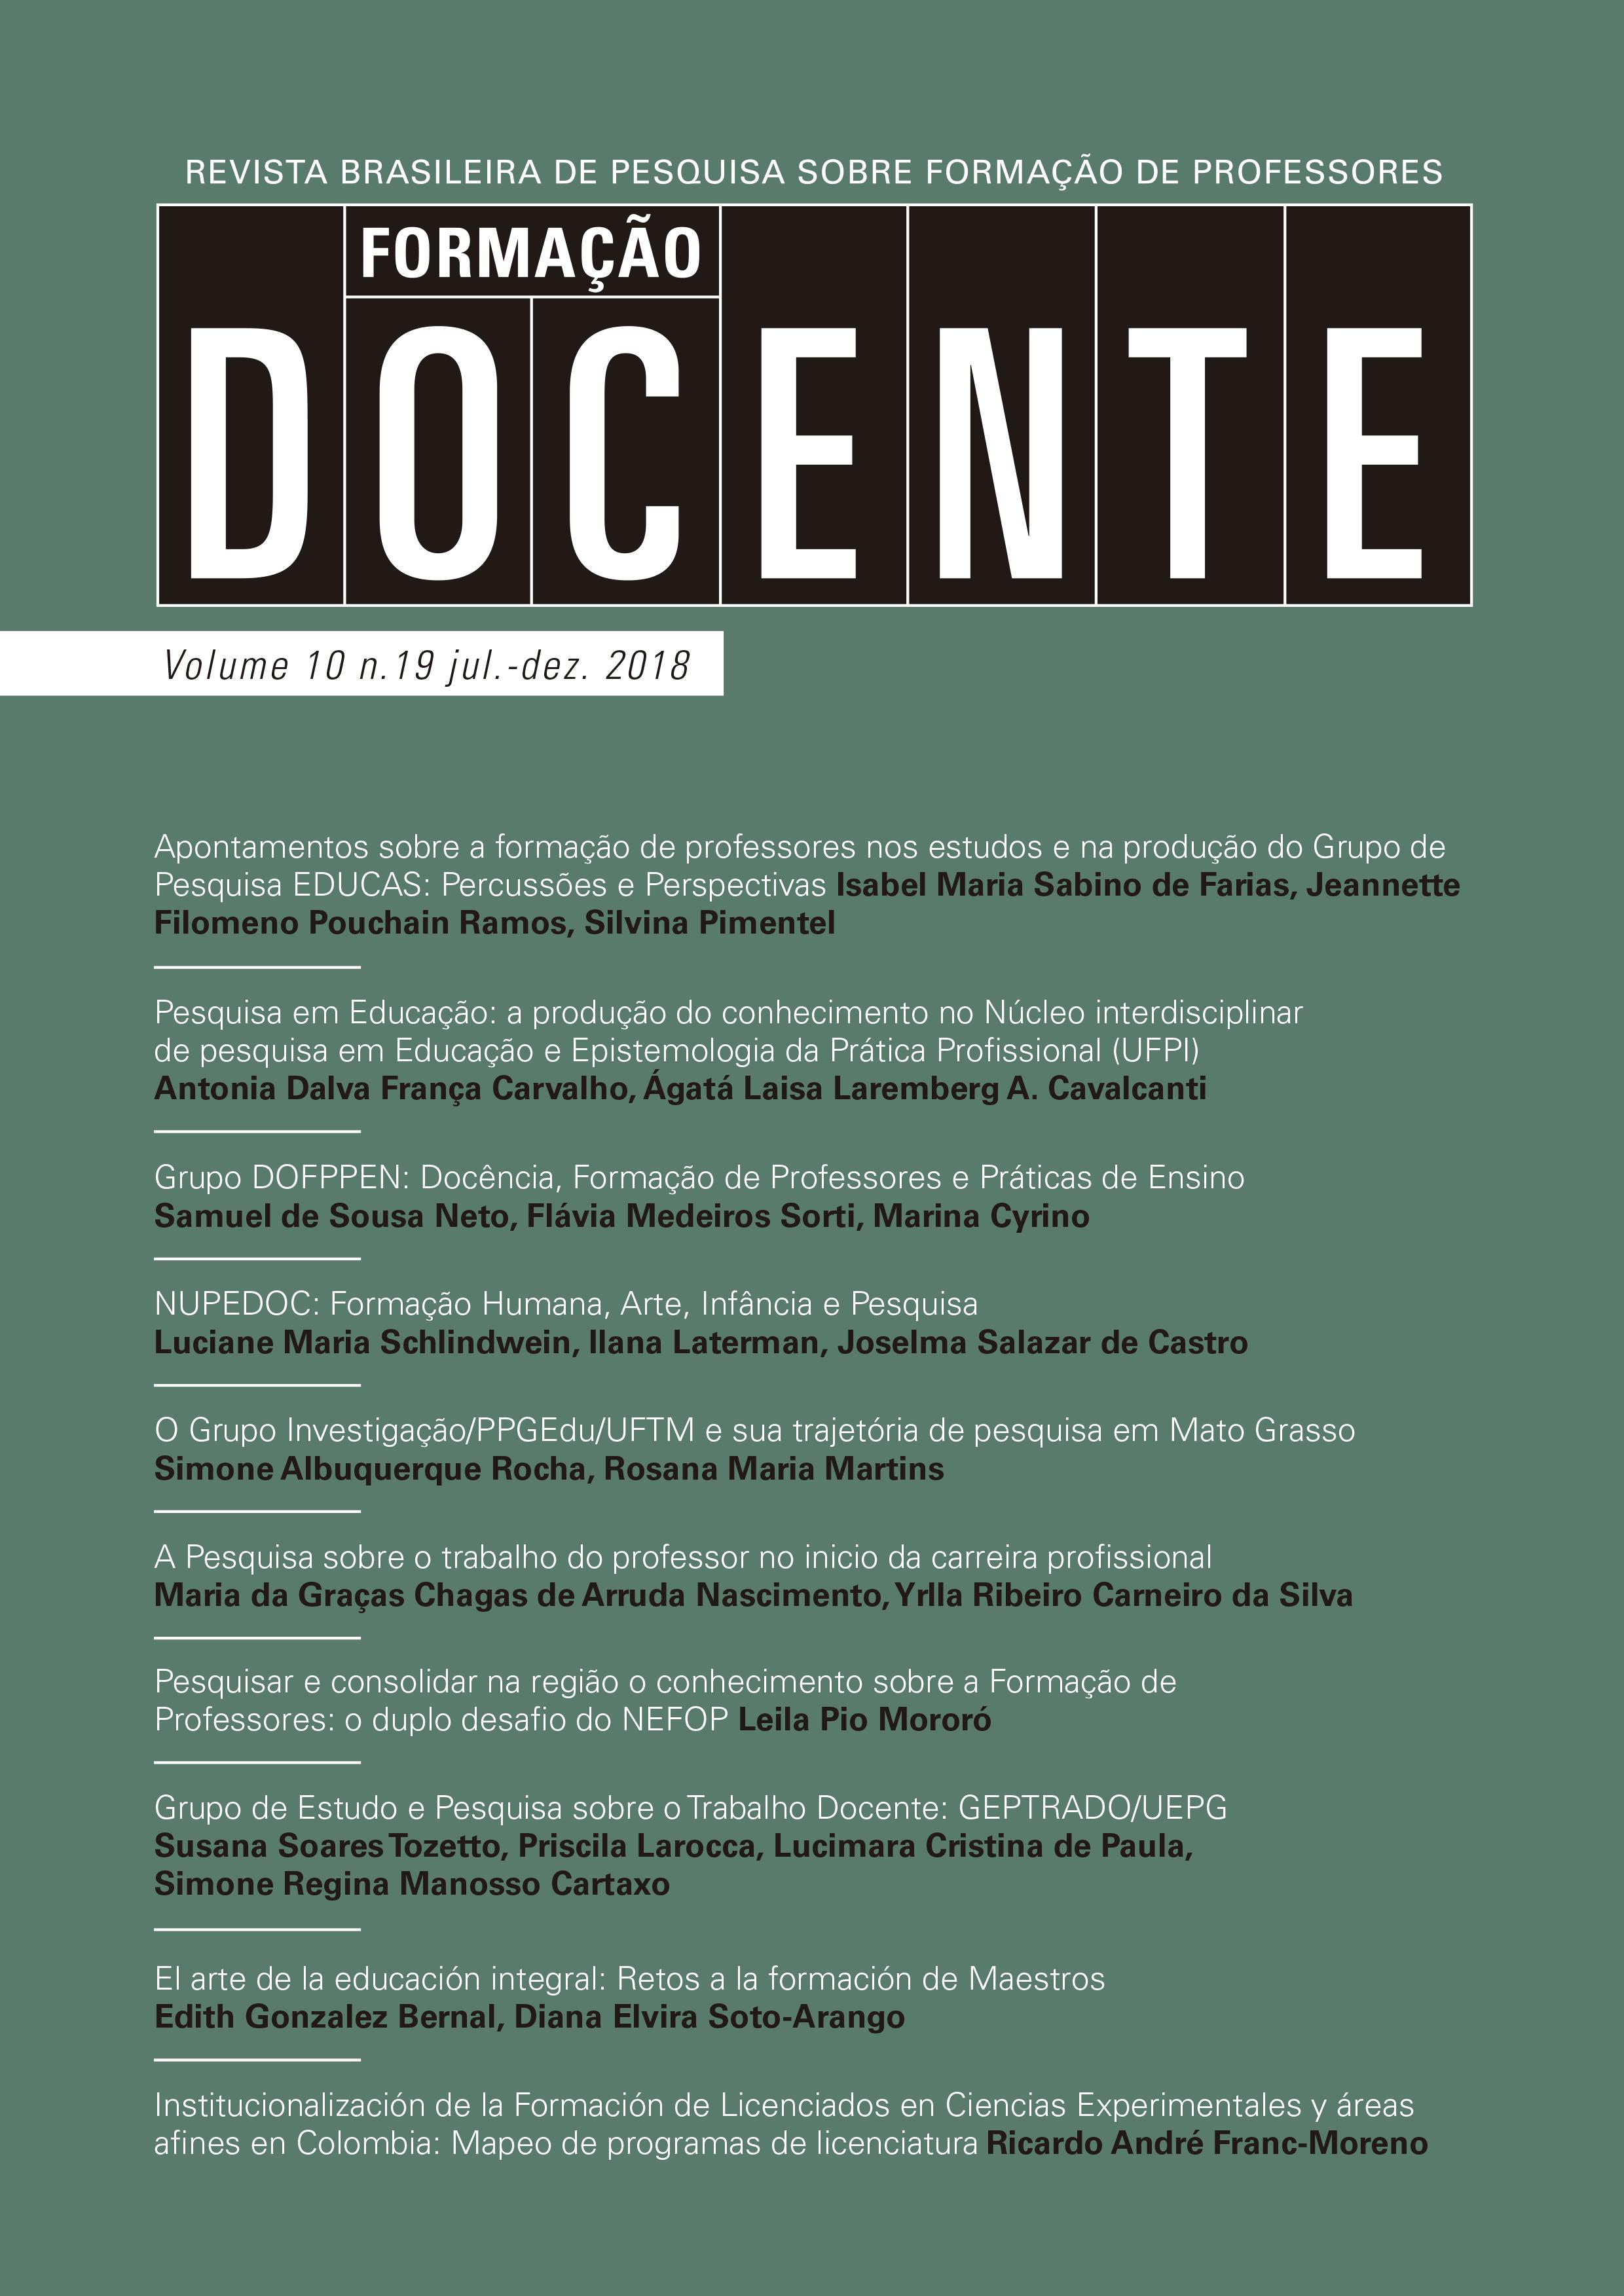 Volume 10, n. 19, ago/dez de 2018